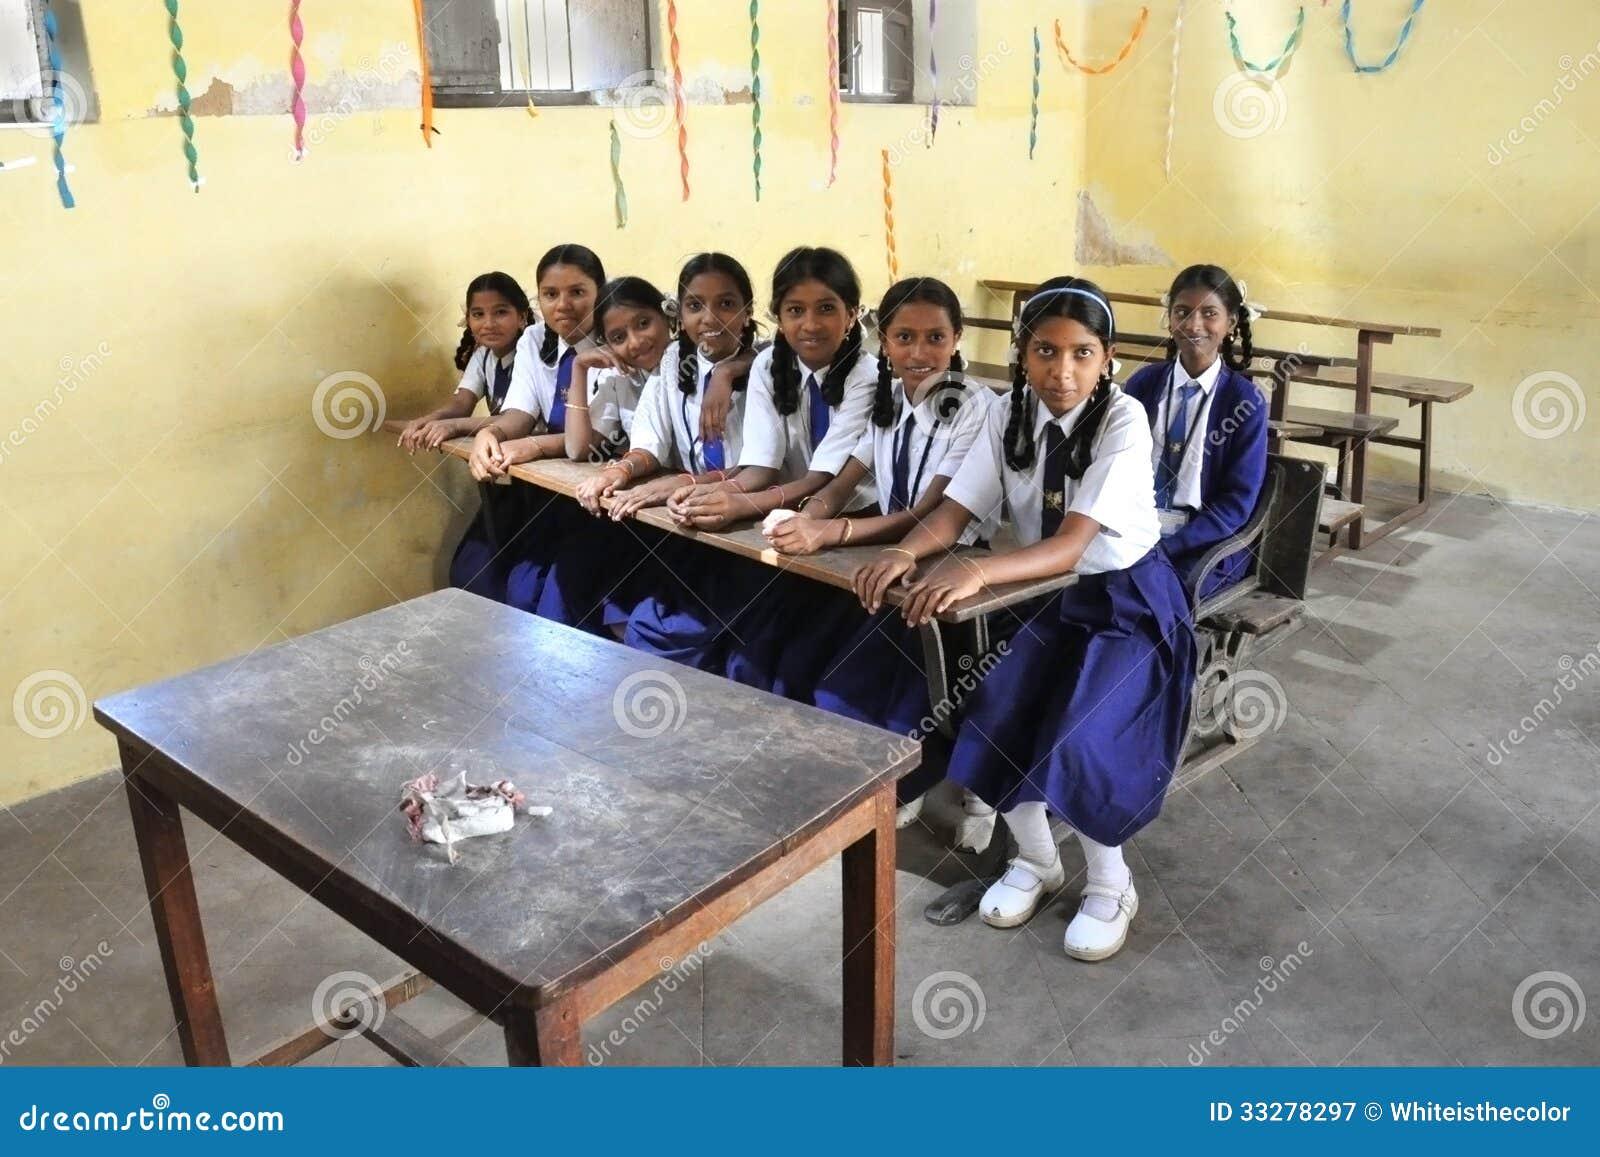 lassroom girls Indian schoolgirls in the classroom Editorial Photography